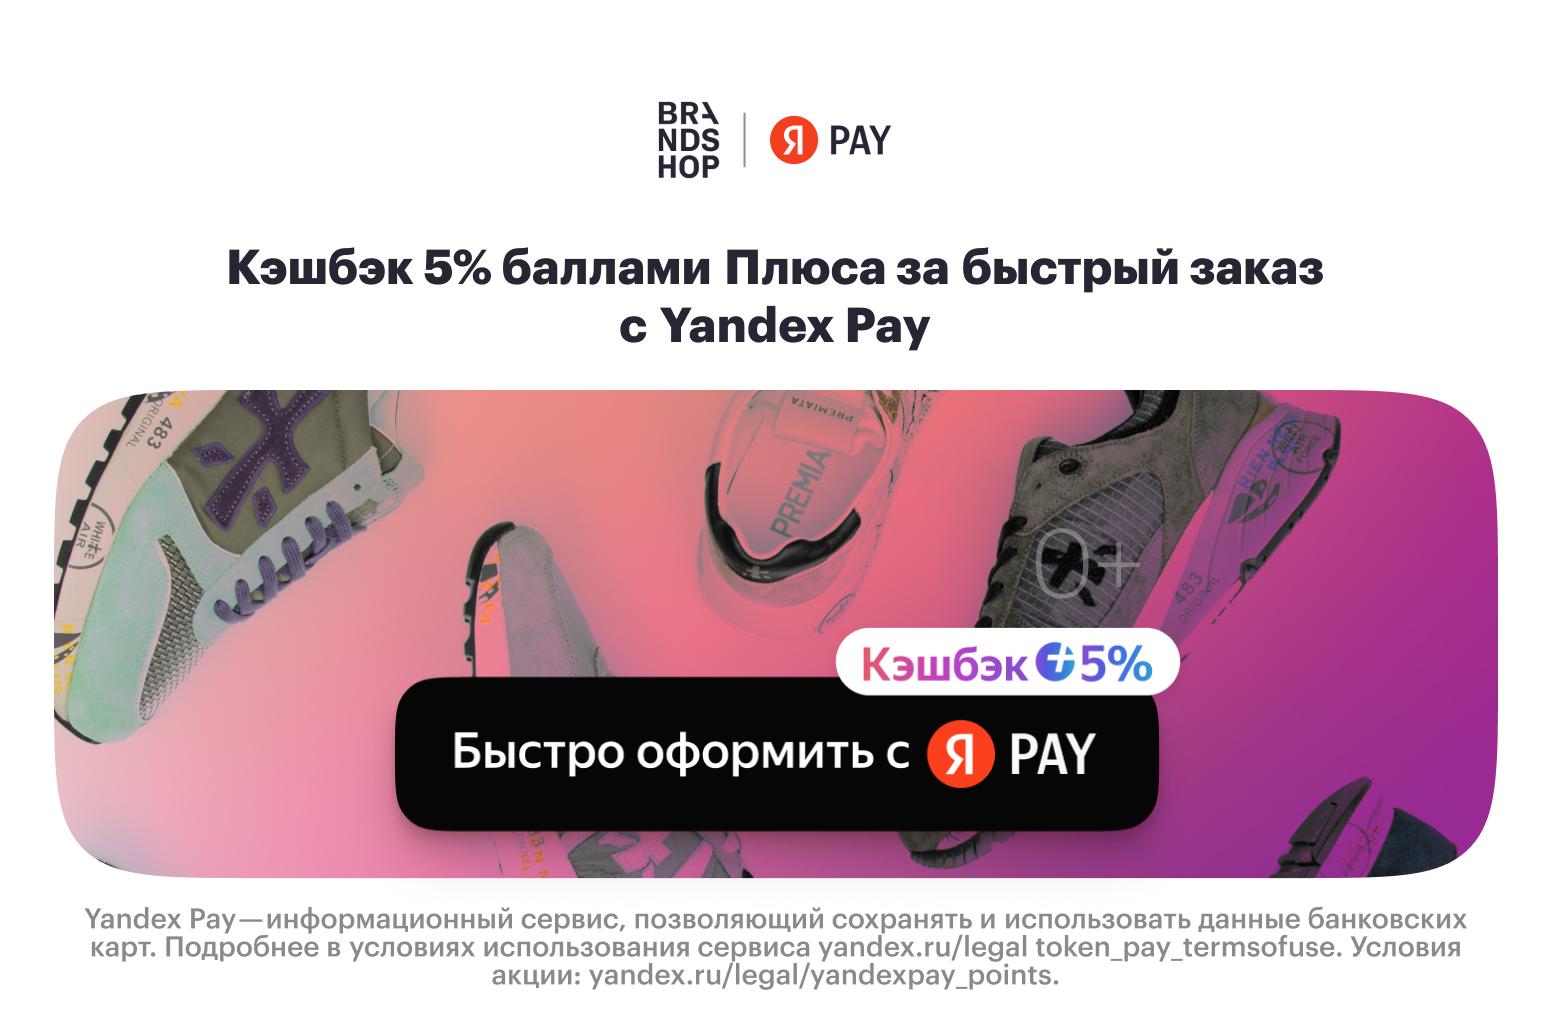 BRANDSHOP x Yandex Pay